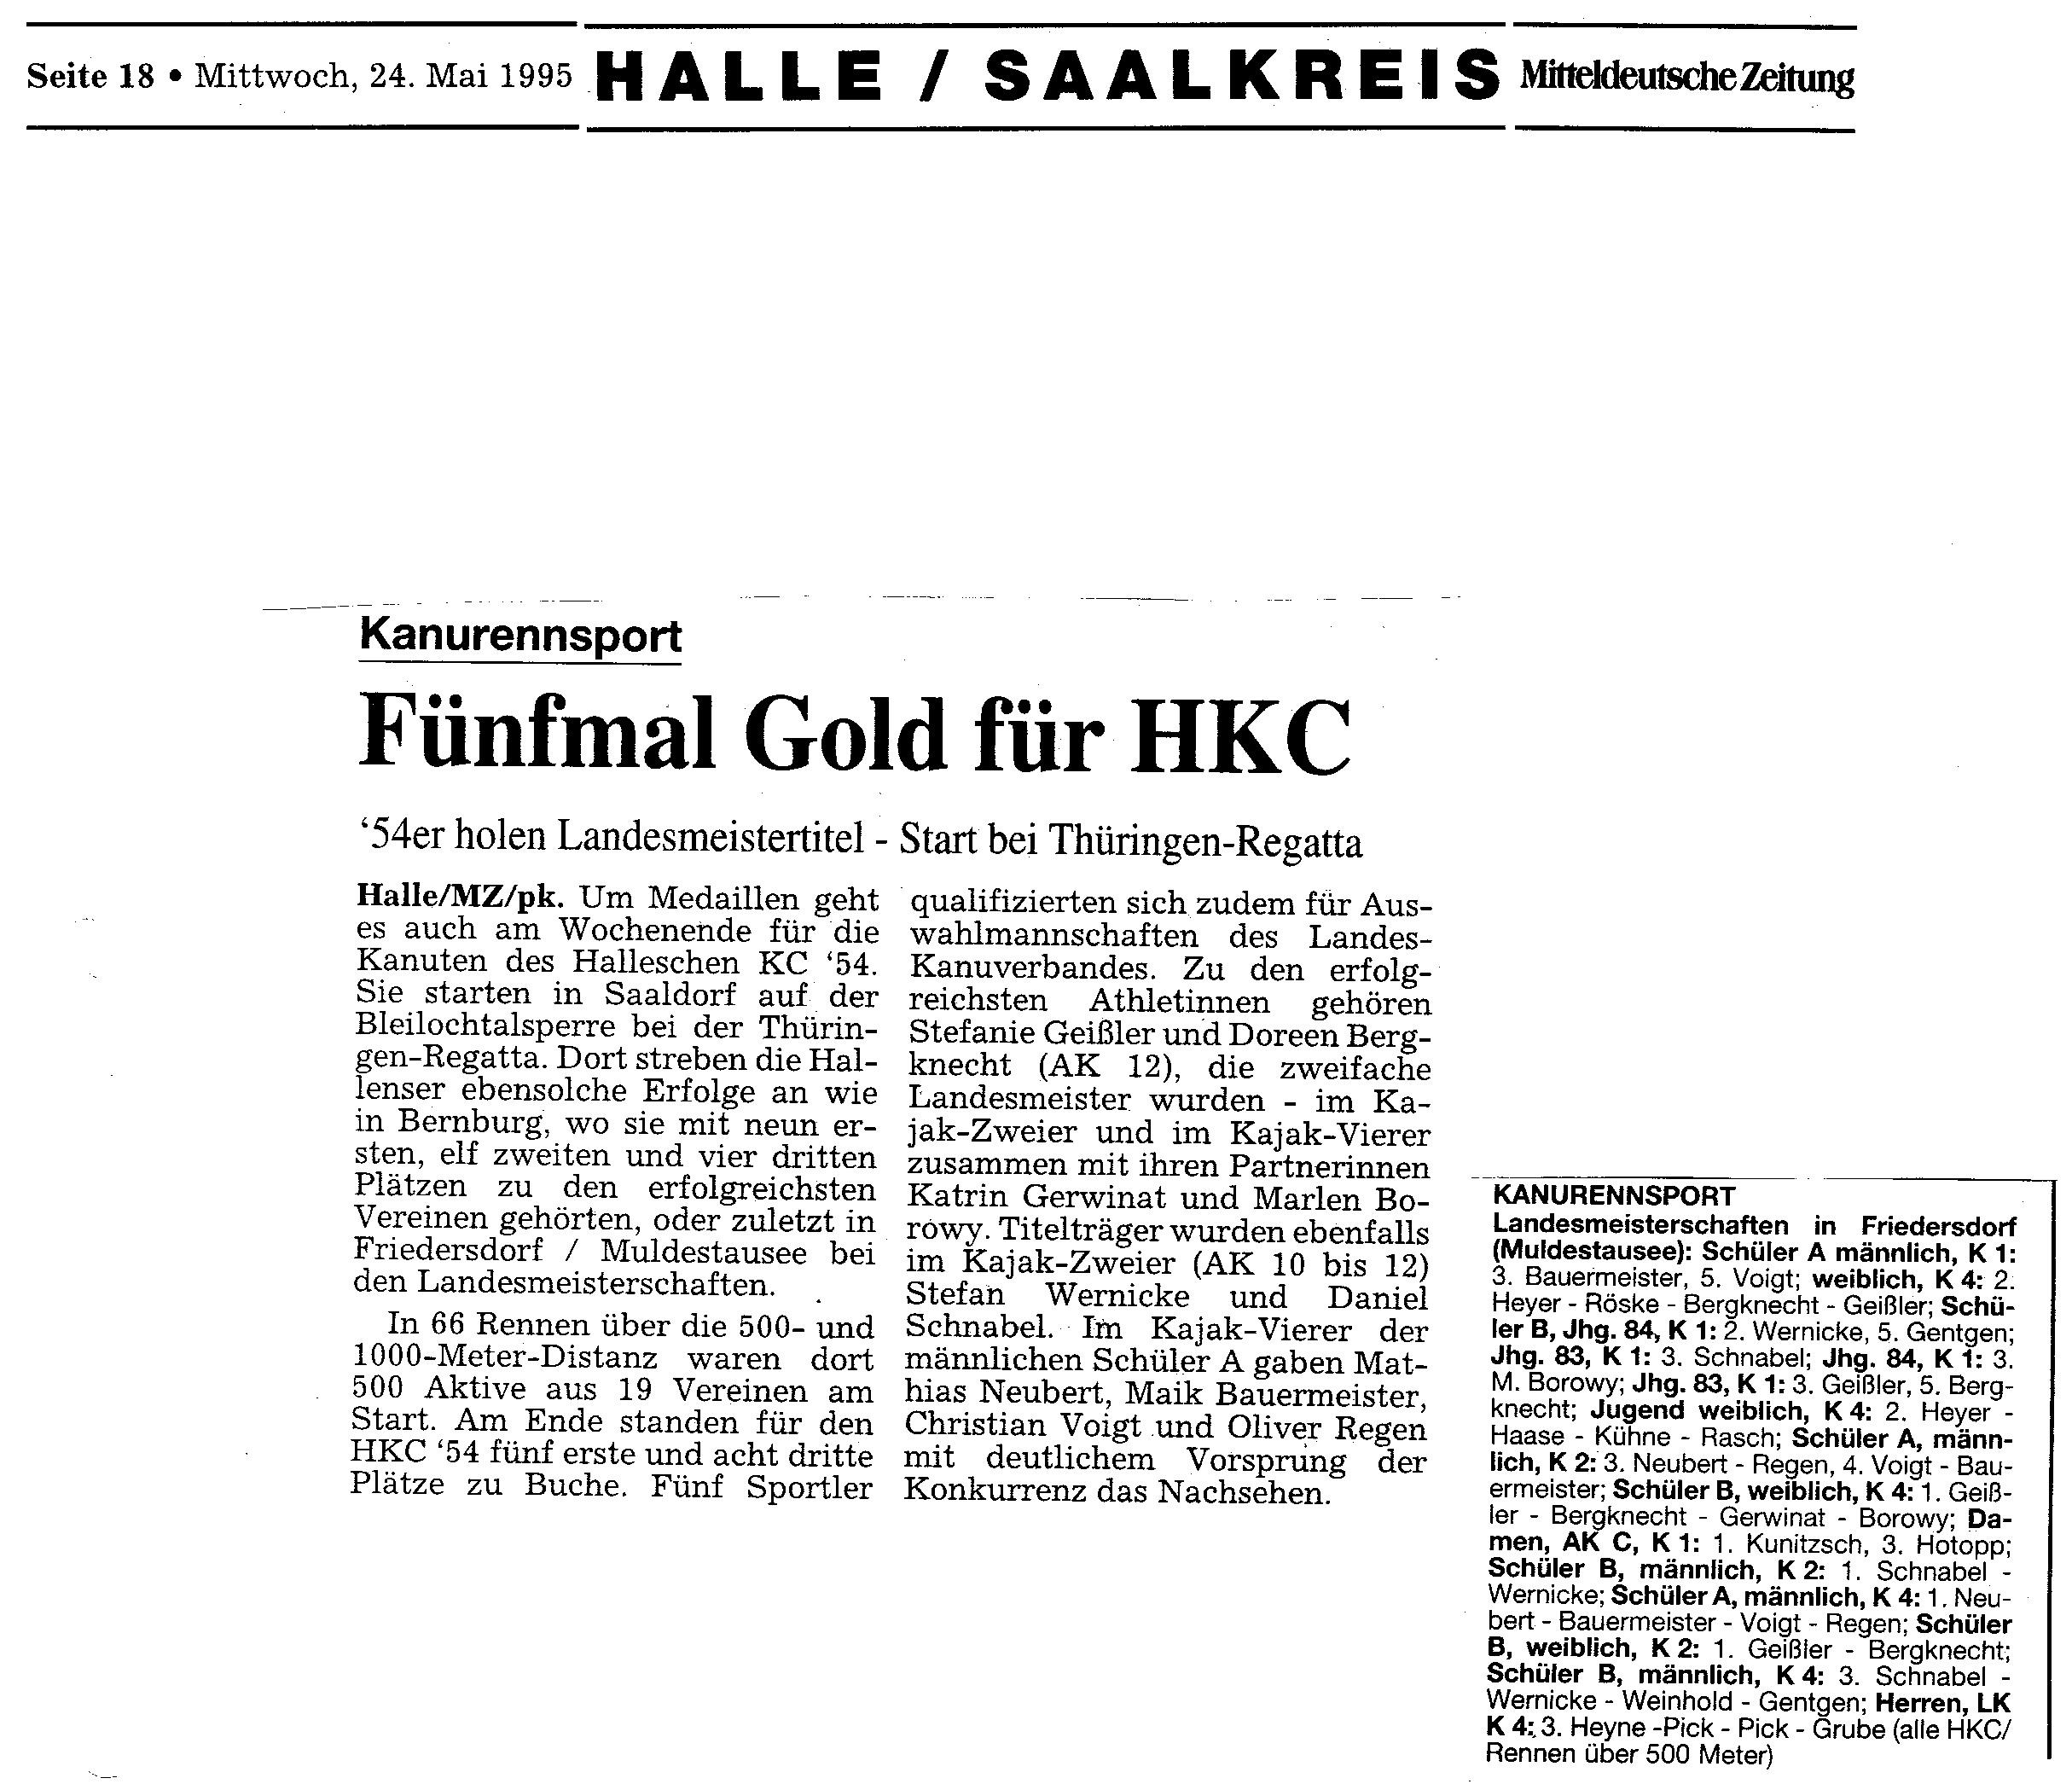 1995-05-24 MZ Fünfmal Gold für HKC